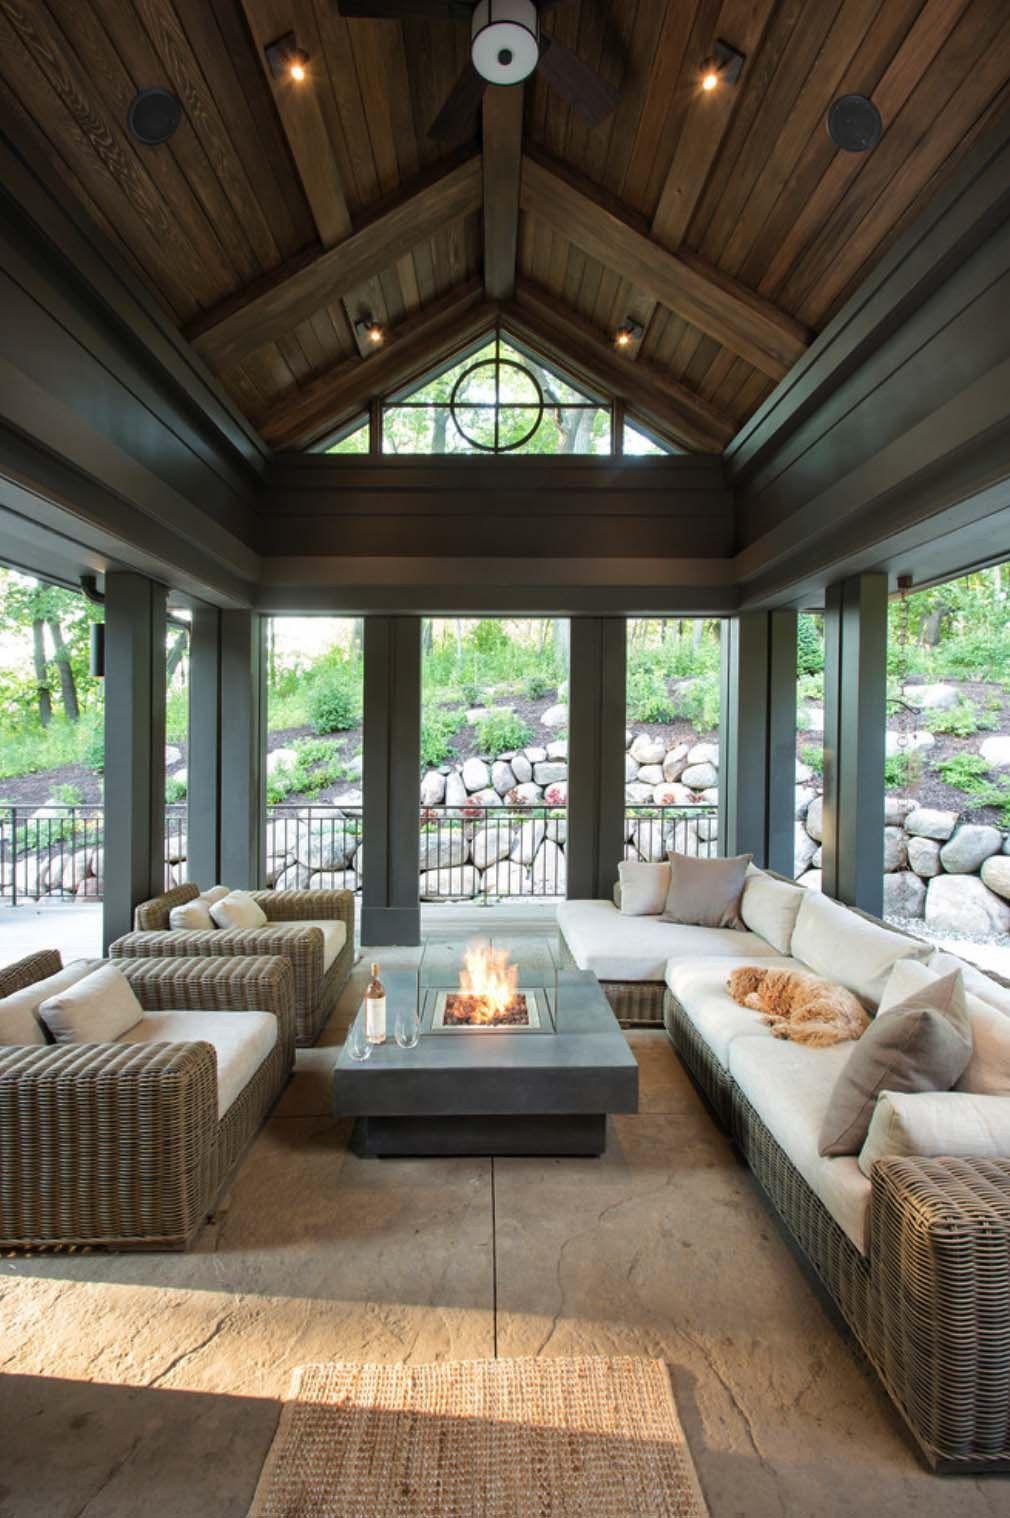 Screened Porch Design Ideas 23 1 Kindesign Porch Design House Design My Dream Home